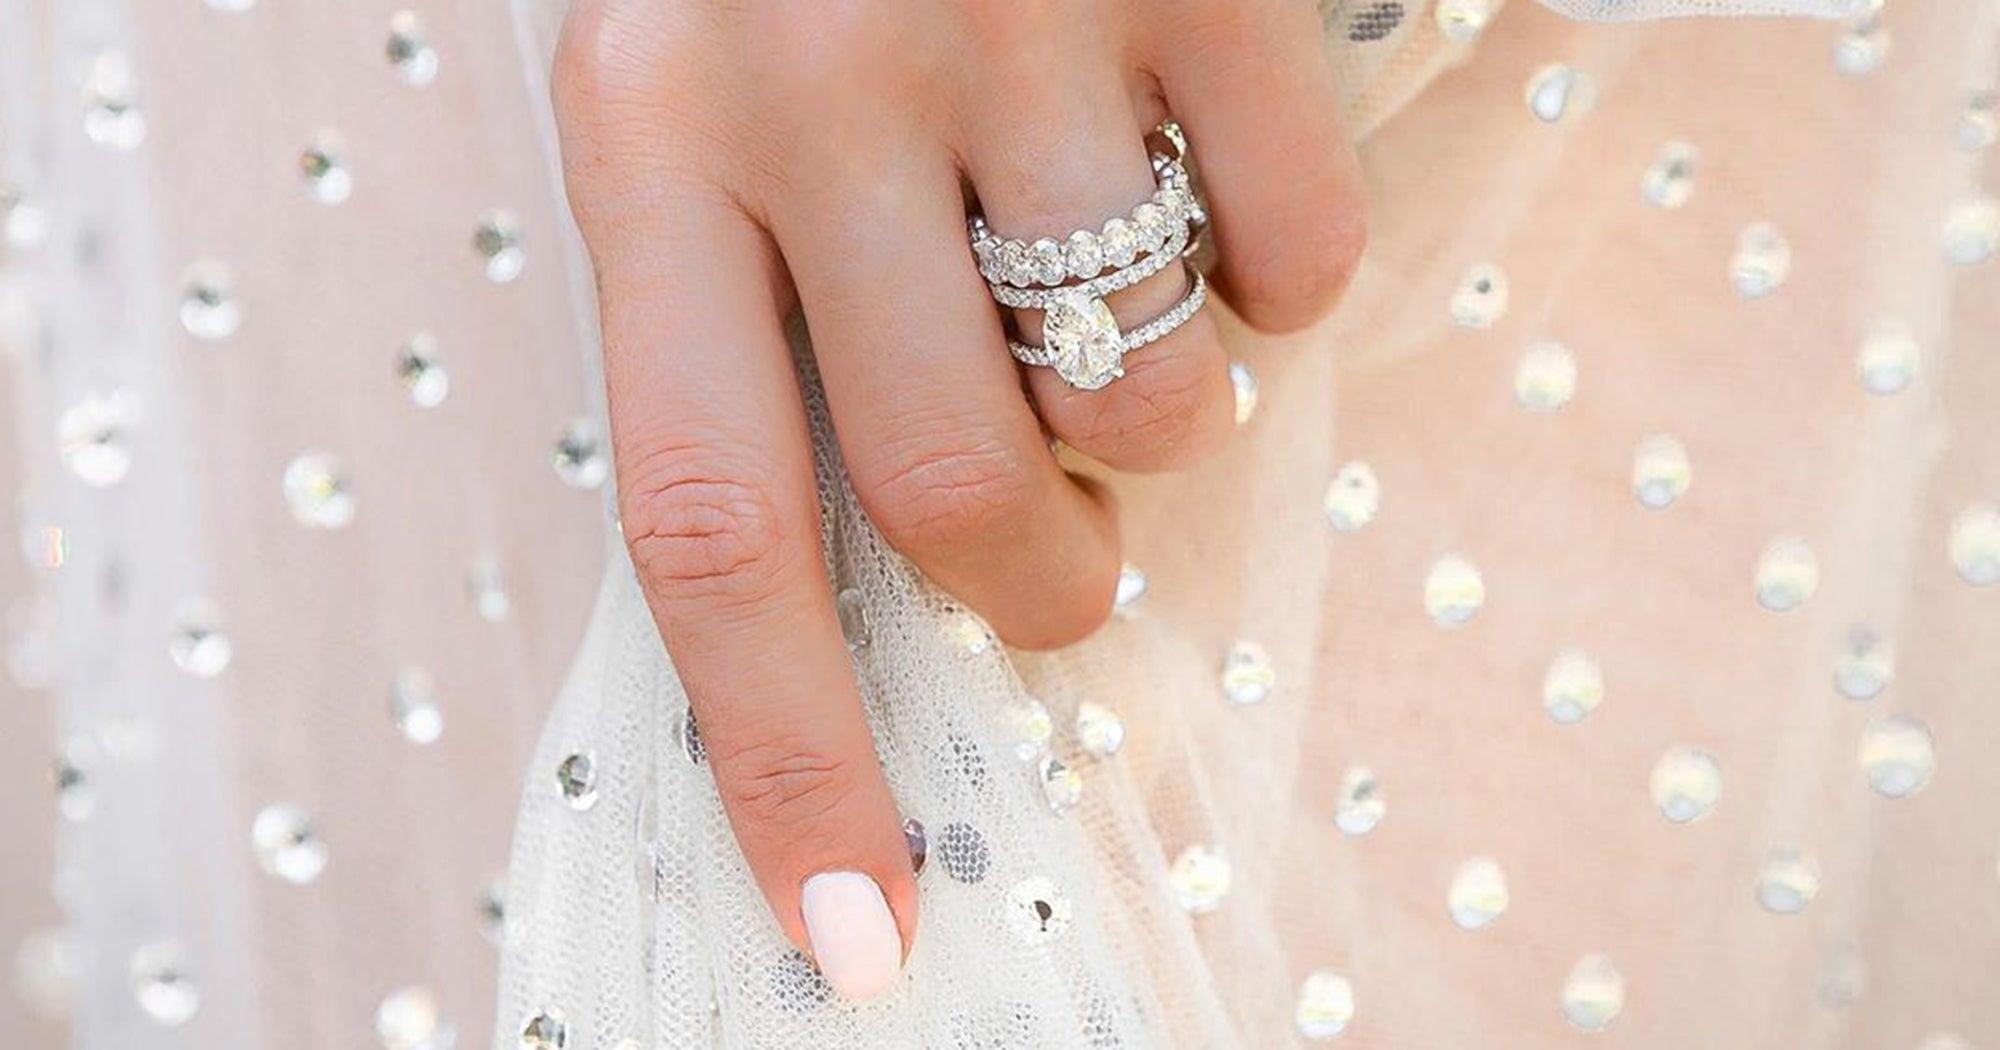 Fall Wedding Nail Polish Colors For Trendy Autumn Bride